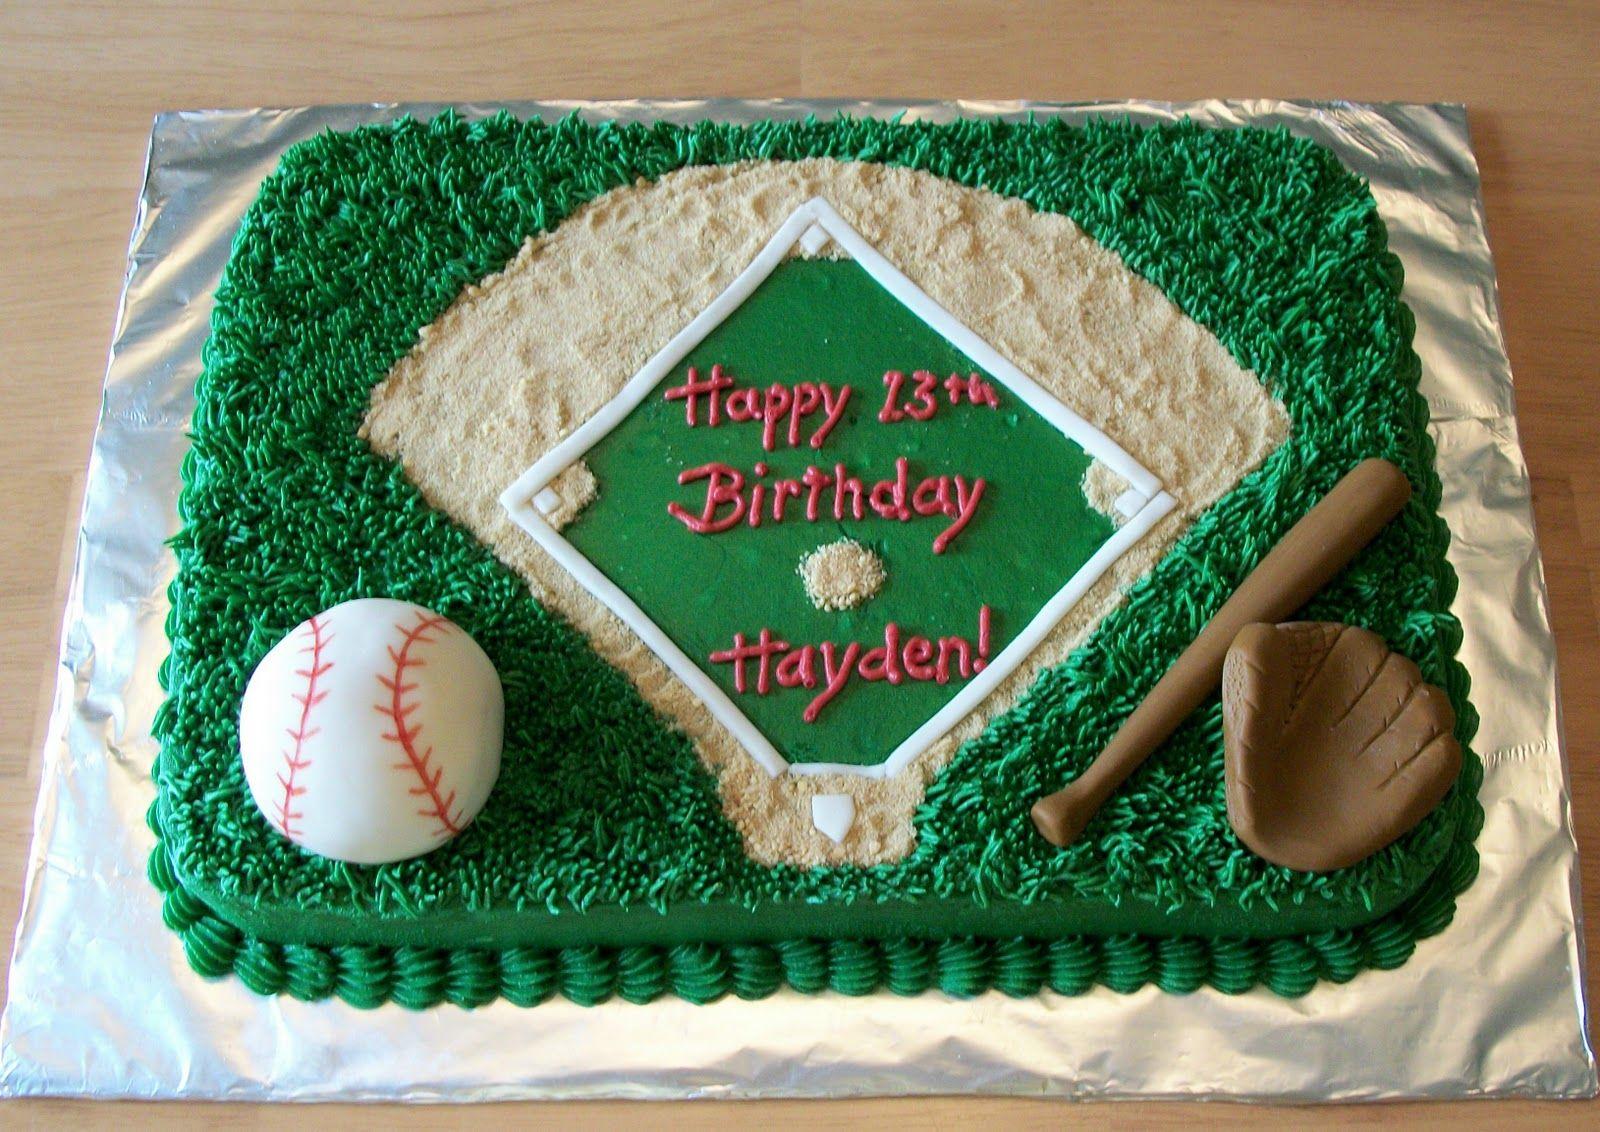 Bellissimo Specialty Cakes Baseball Cake 111 Pin for